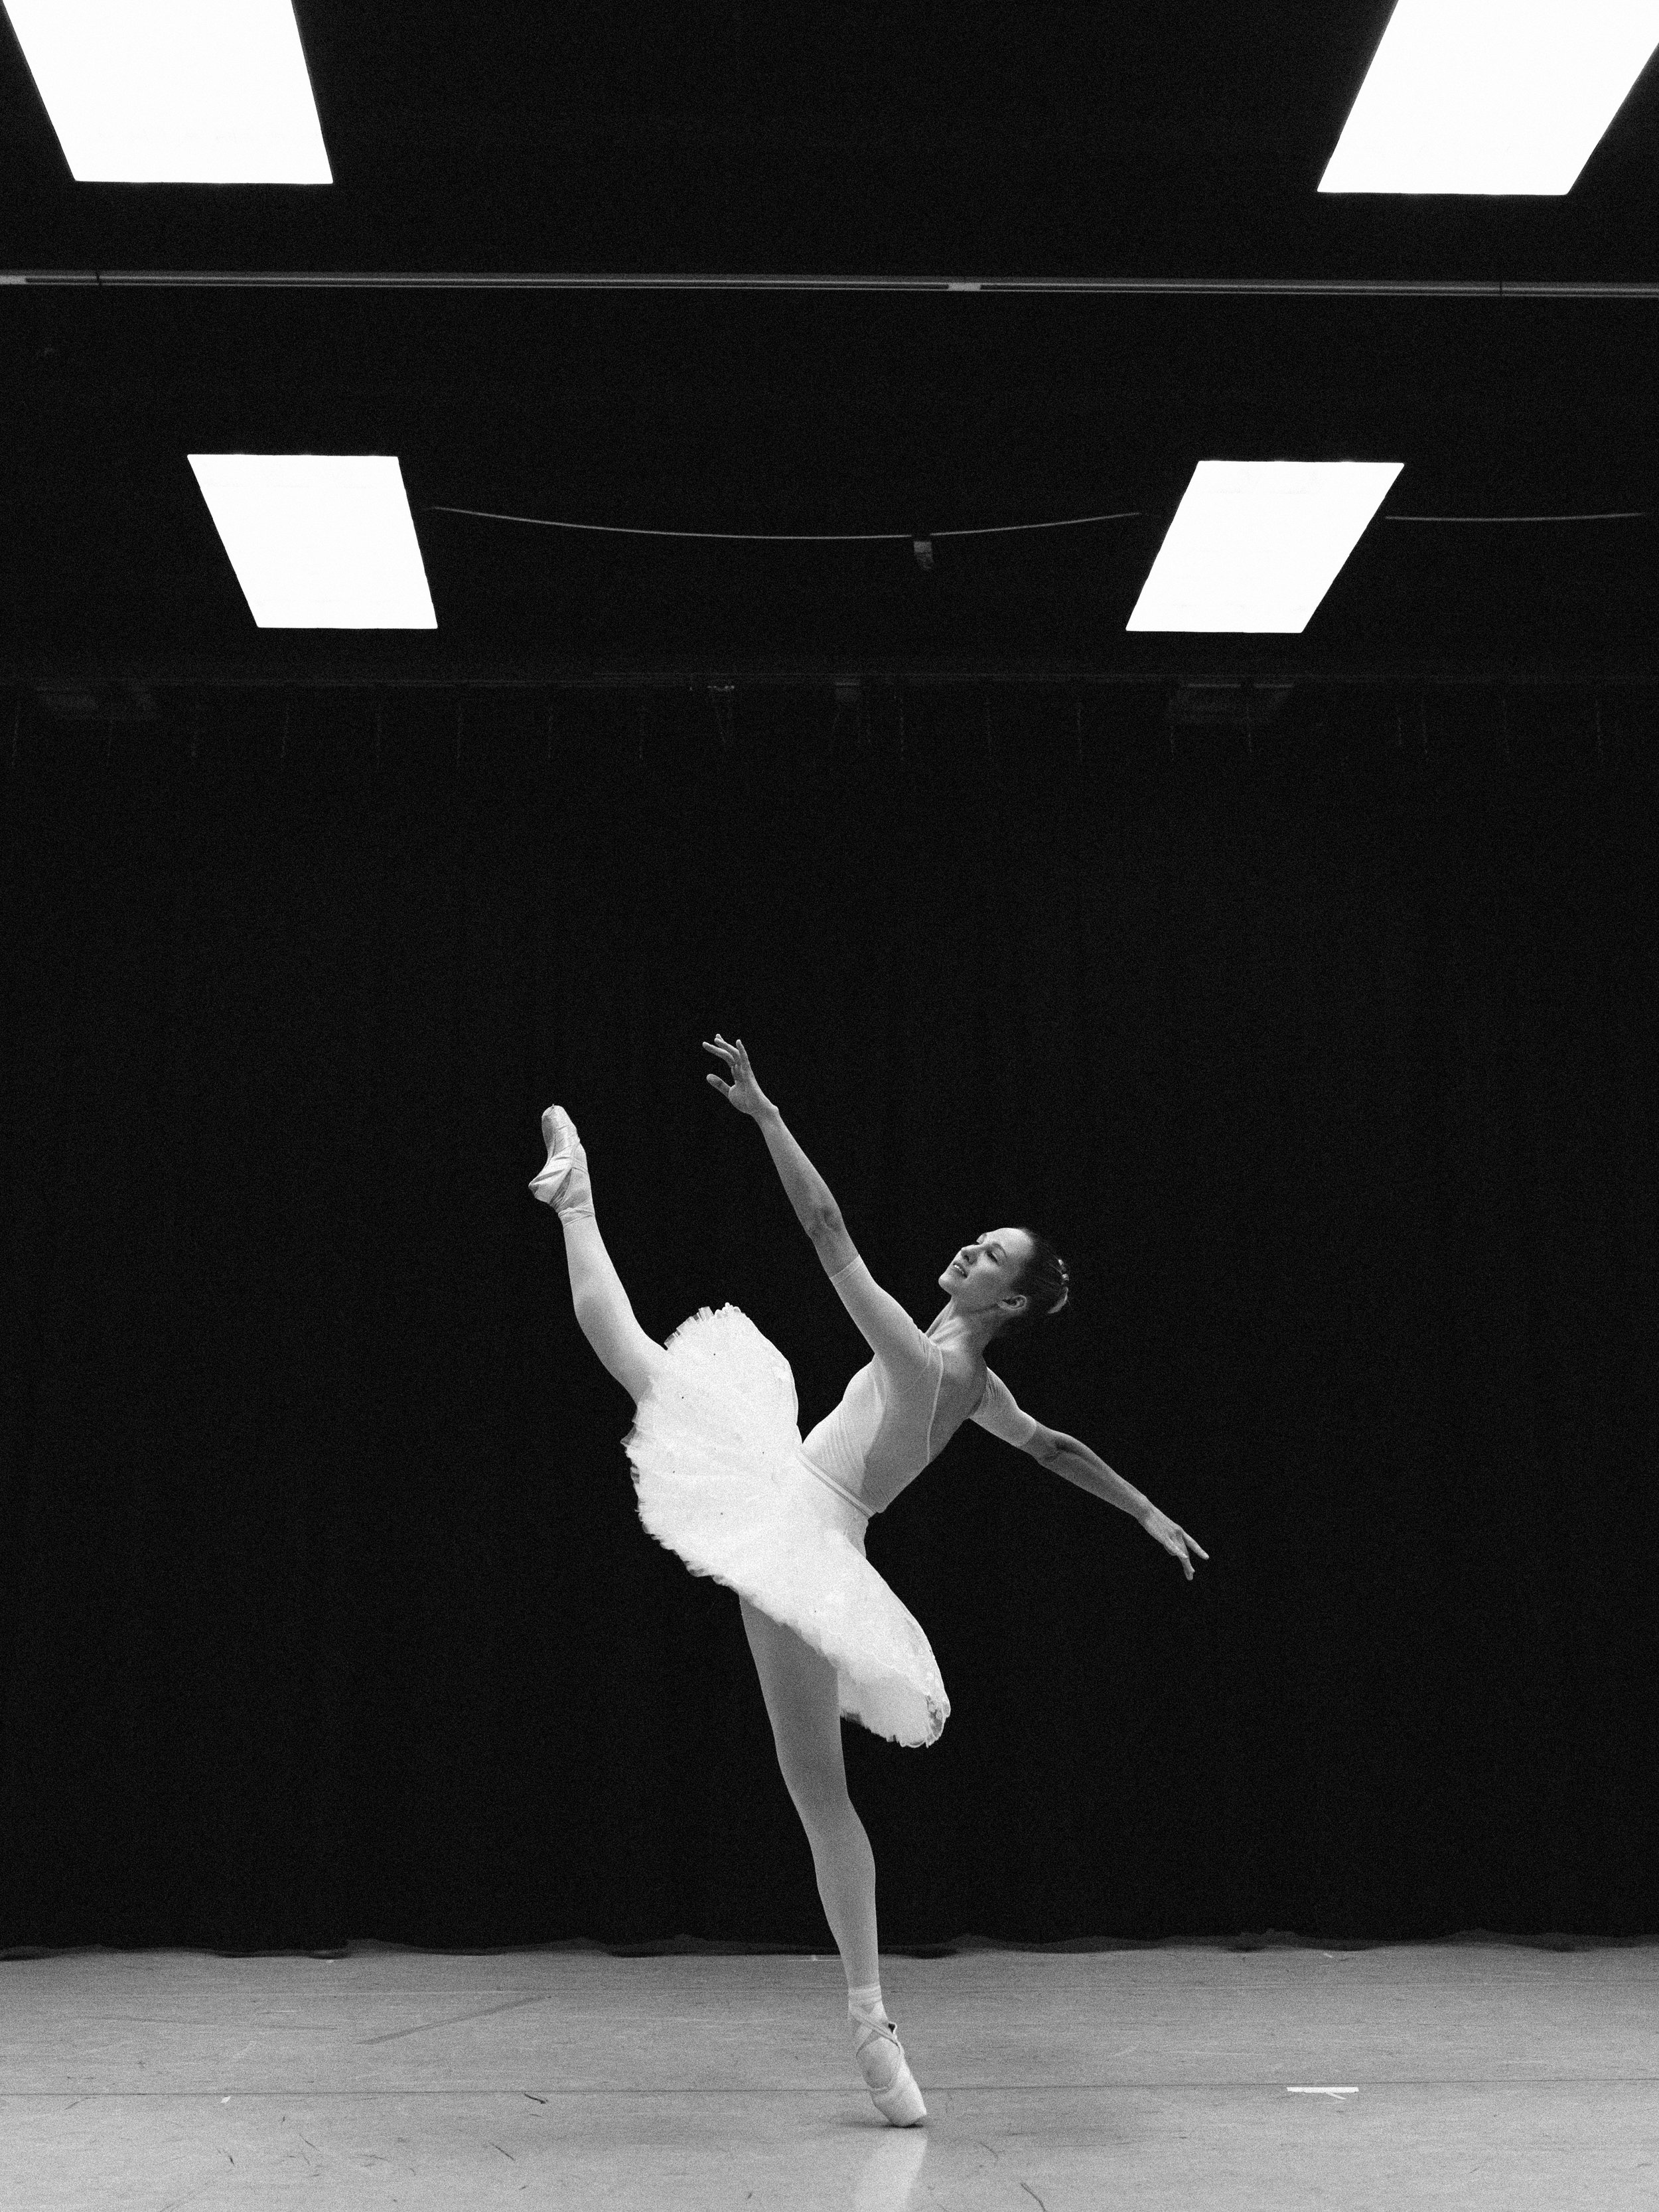 Jessica_Ballet-20.JPG